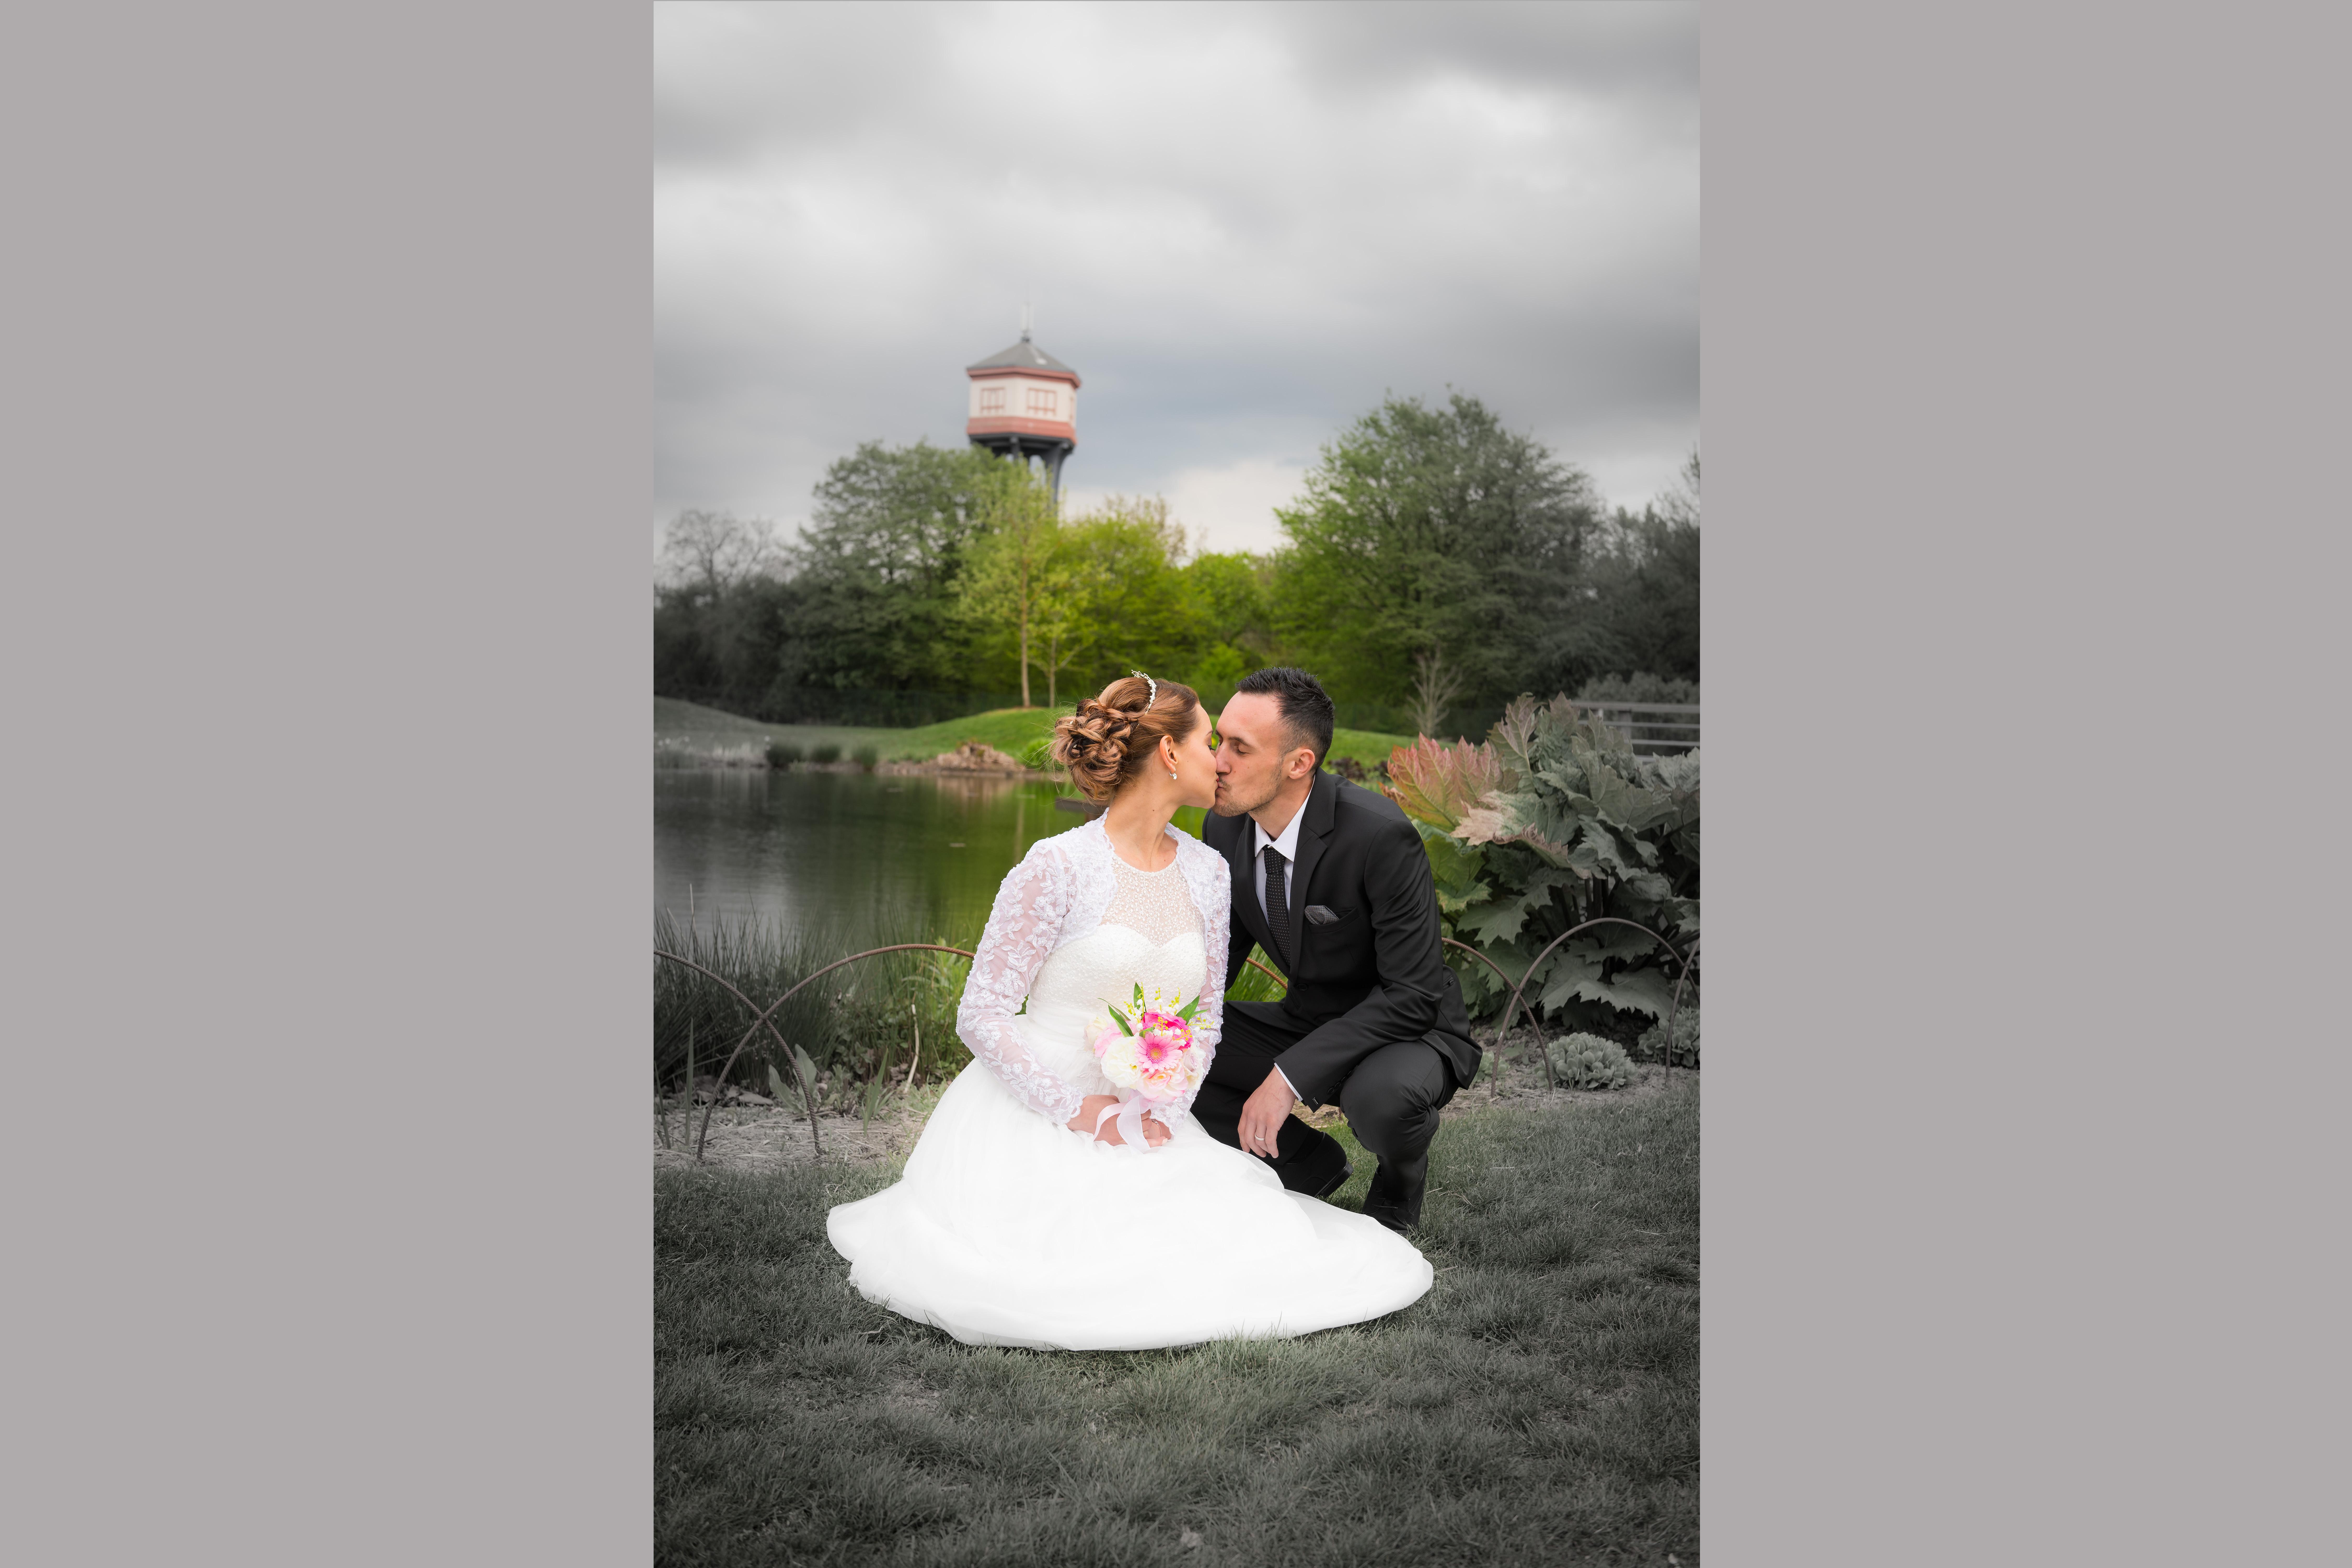 2017-04-15 Adeline Braghiroli - Florian - mariage (424)